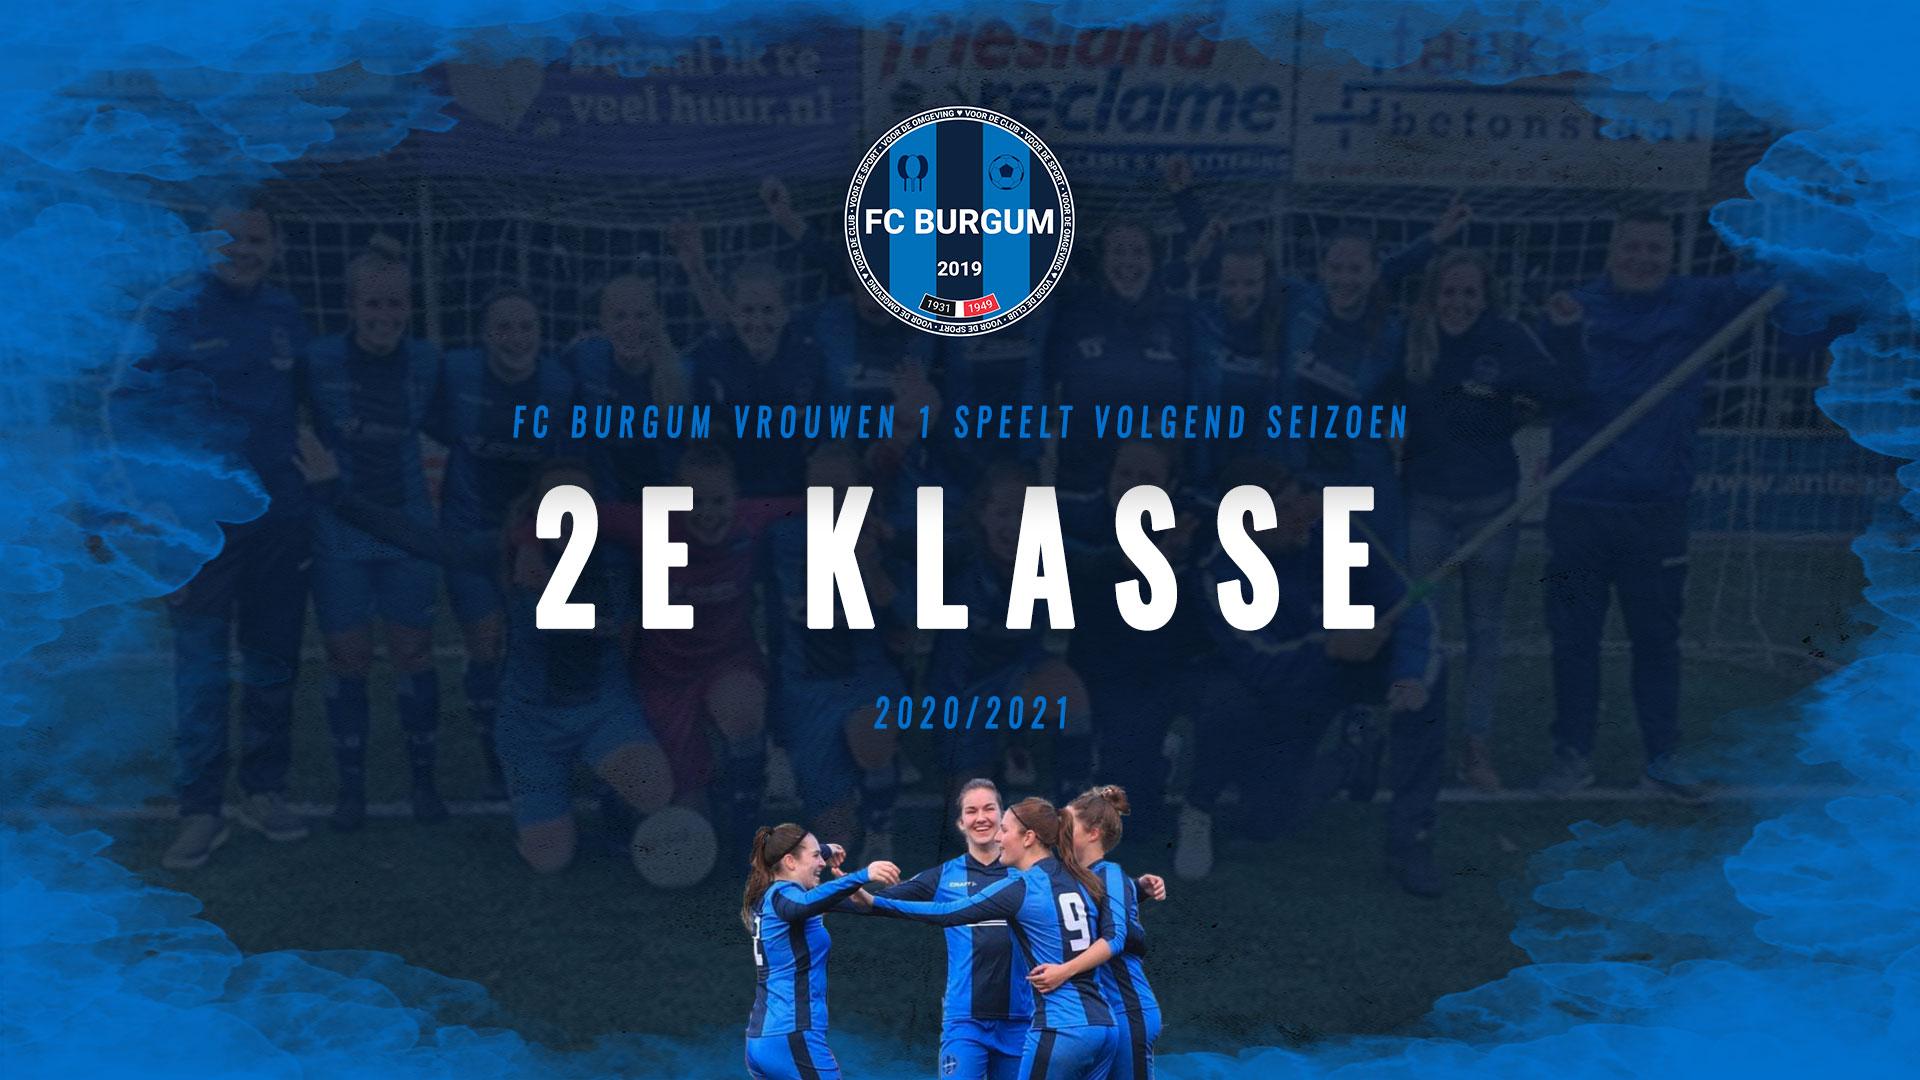 FC BURGUM VROUWEN 1 SPEELT VOLGEND SEIZOEN 2E KLASSE!